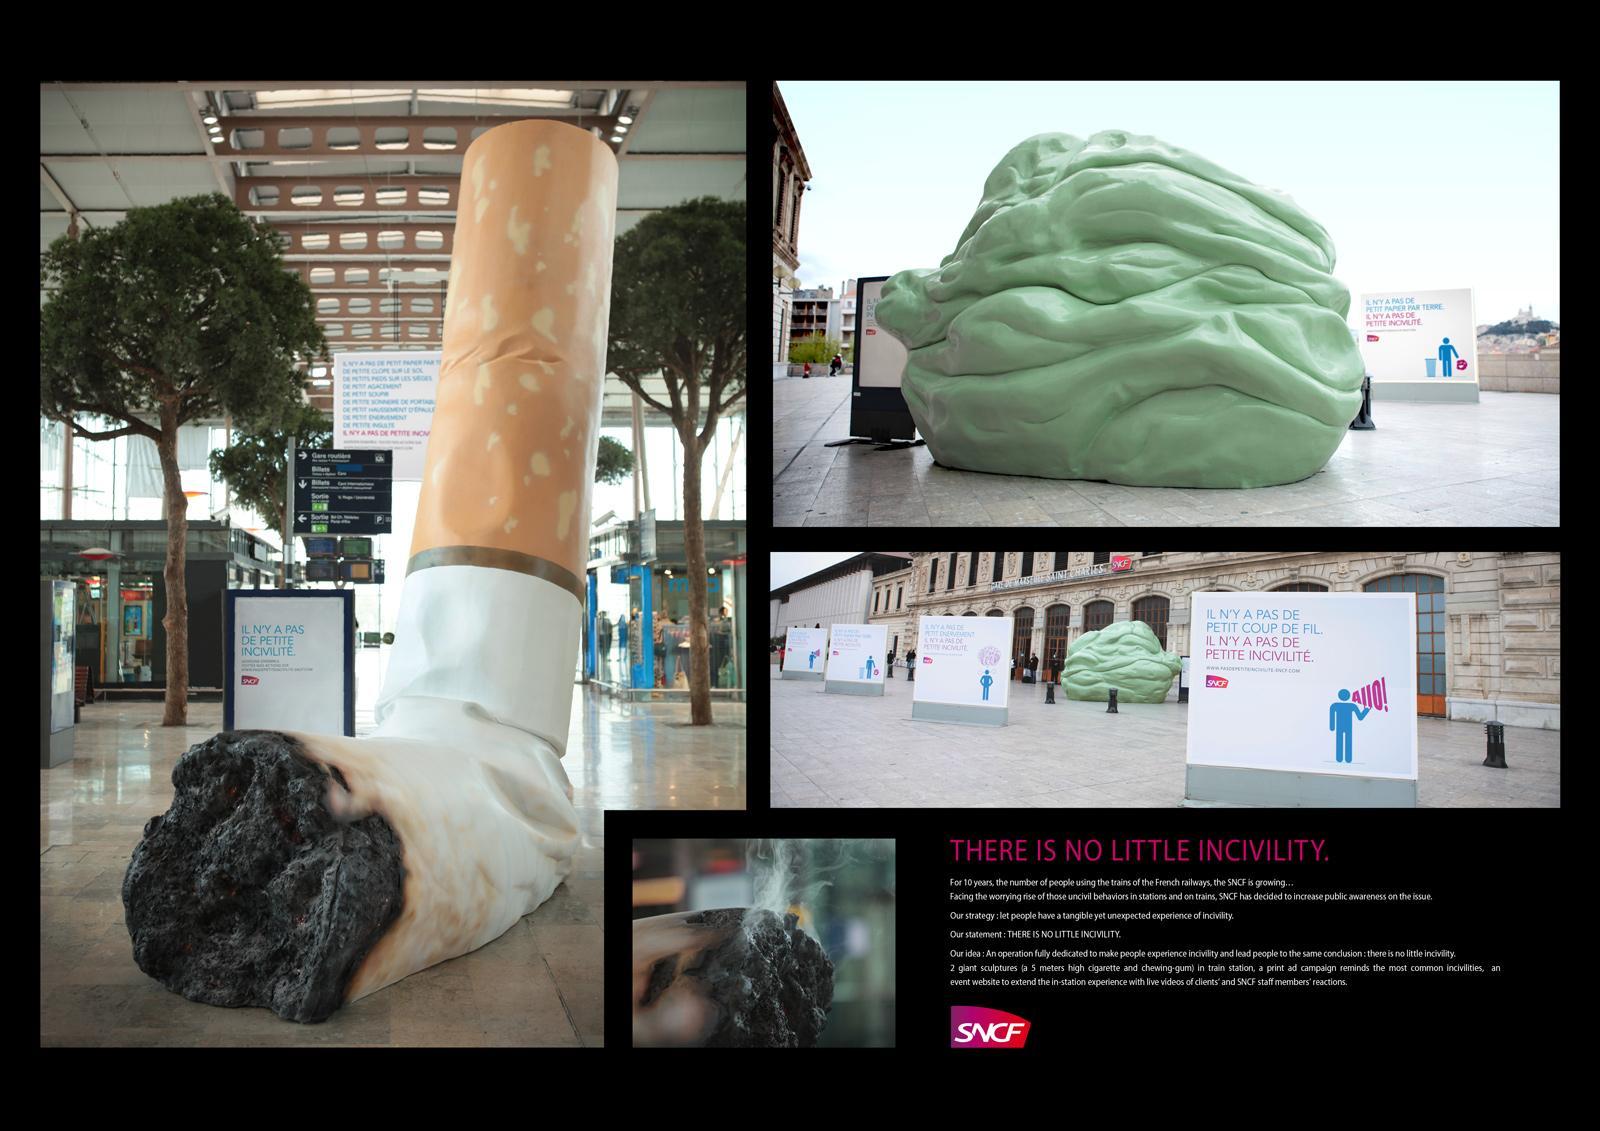 SNCF Webradio Ambient Ad -  Incivility